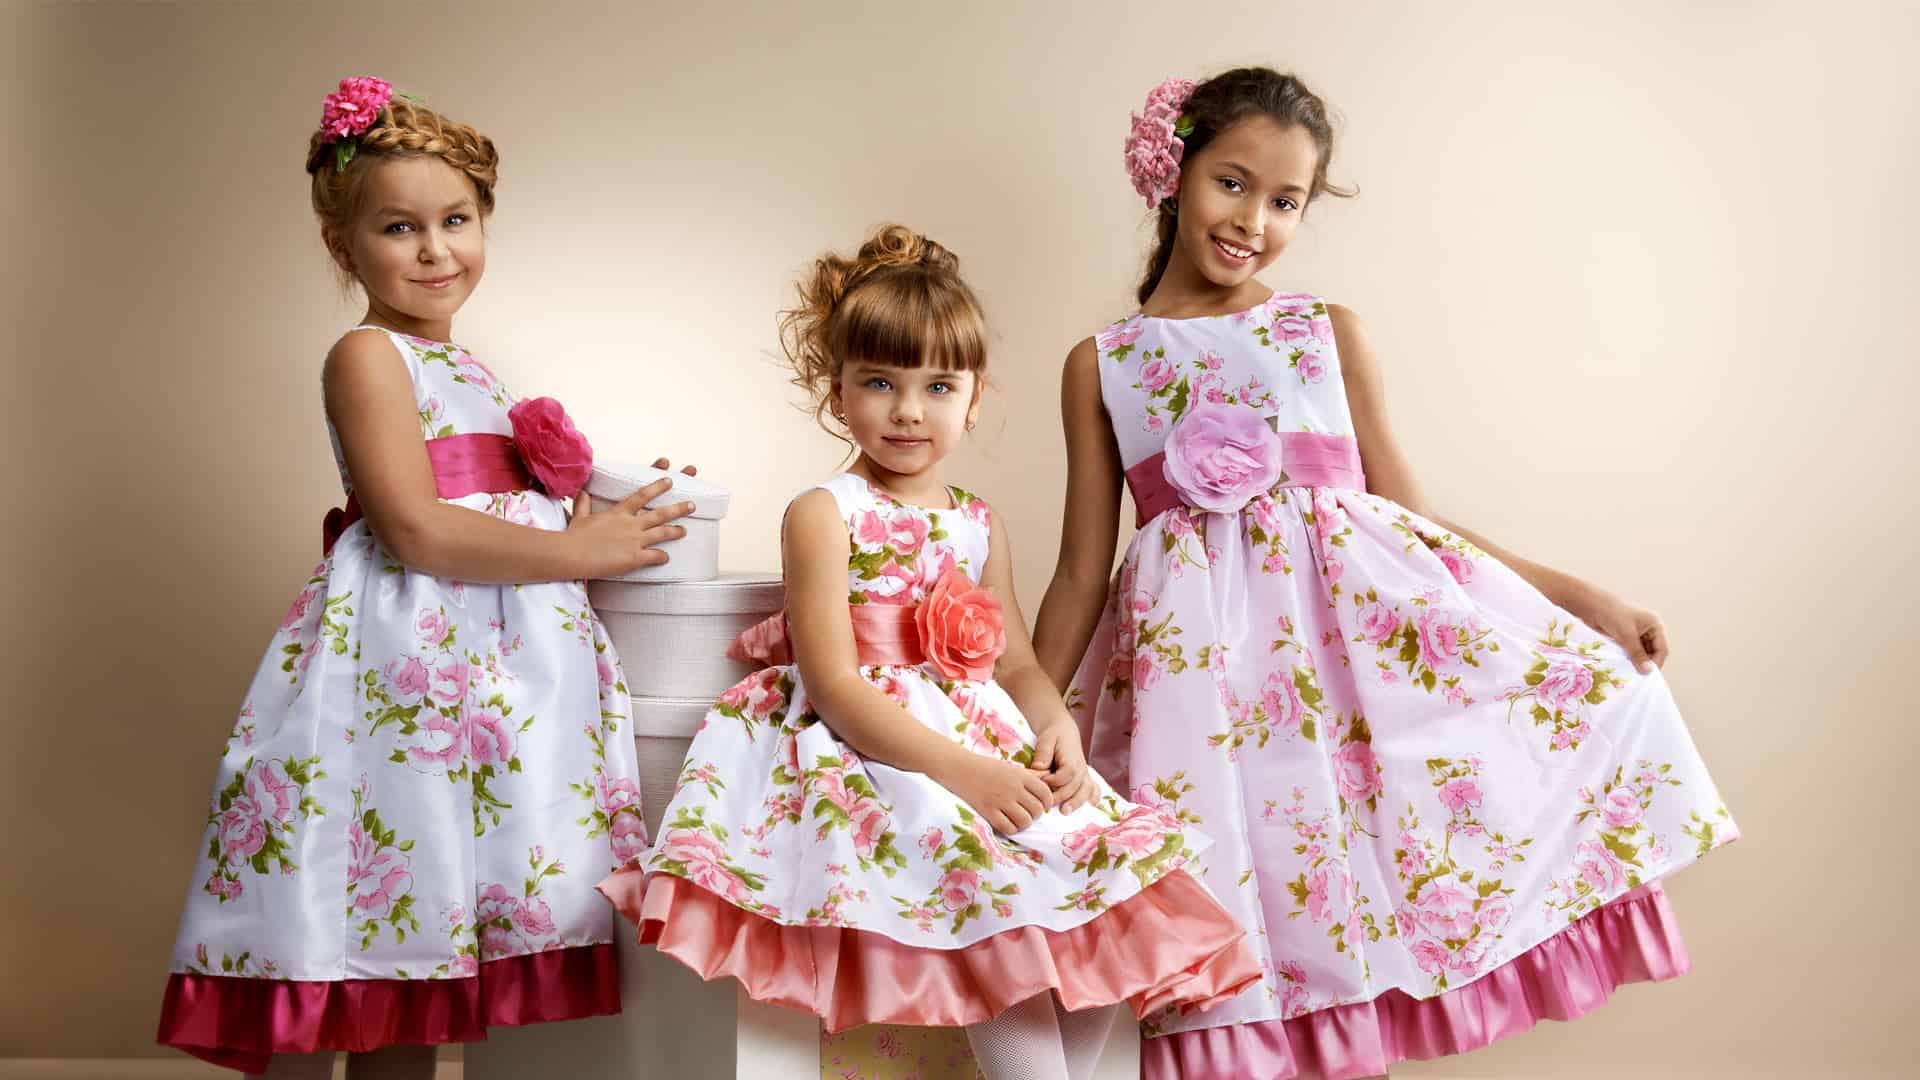 Kids-fashion-trends-2016-girls-sundresses-7